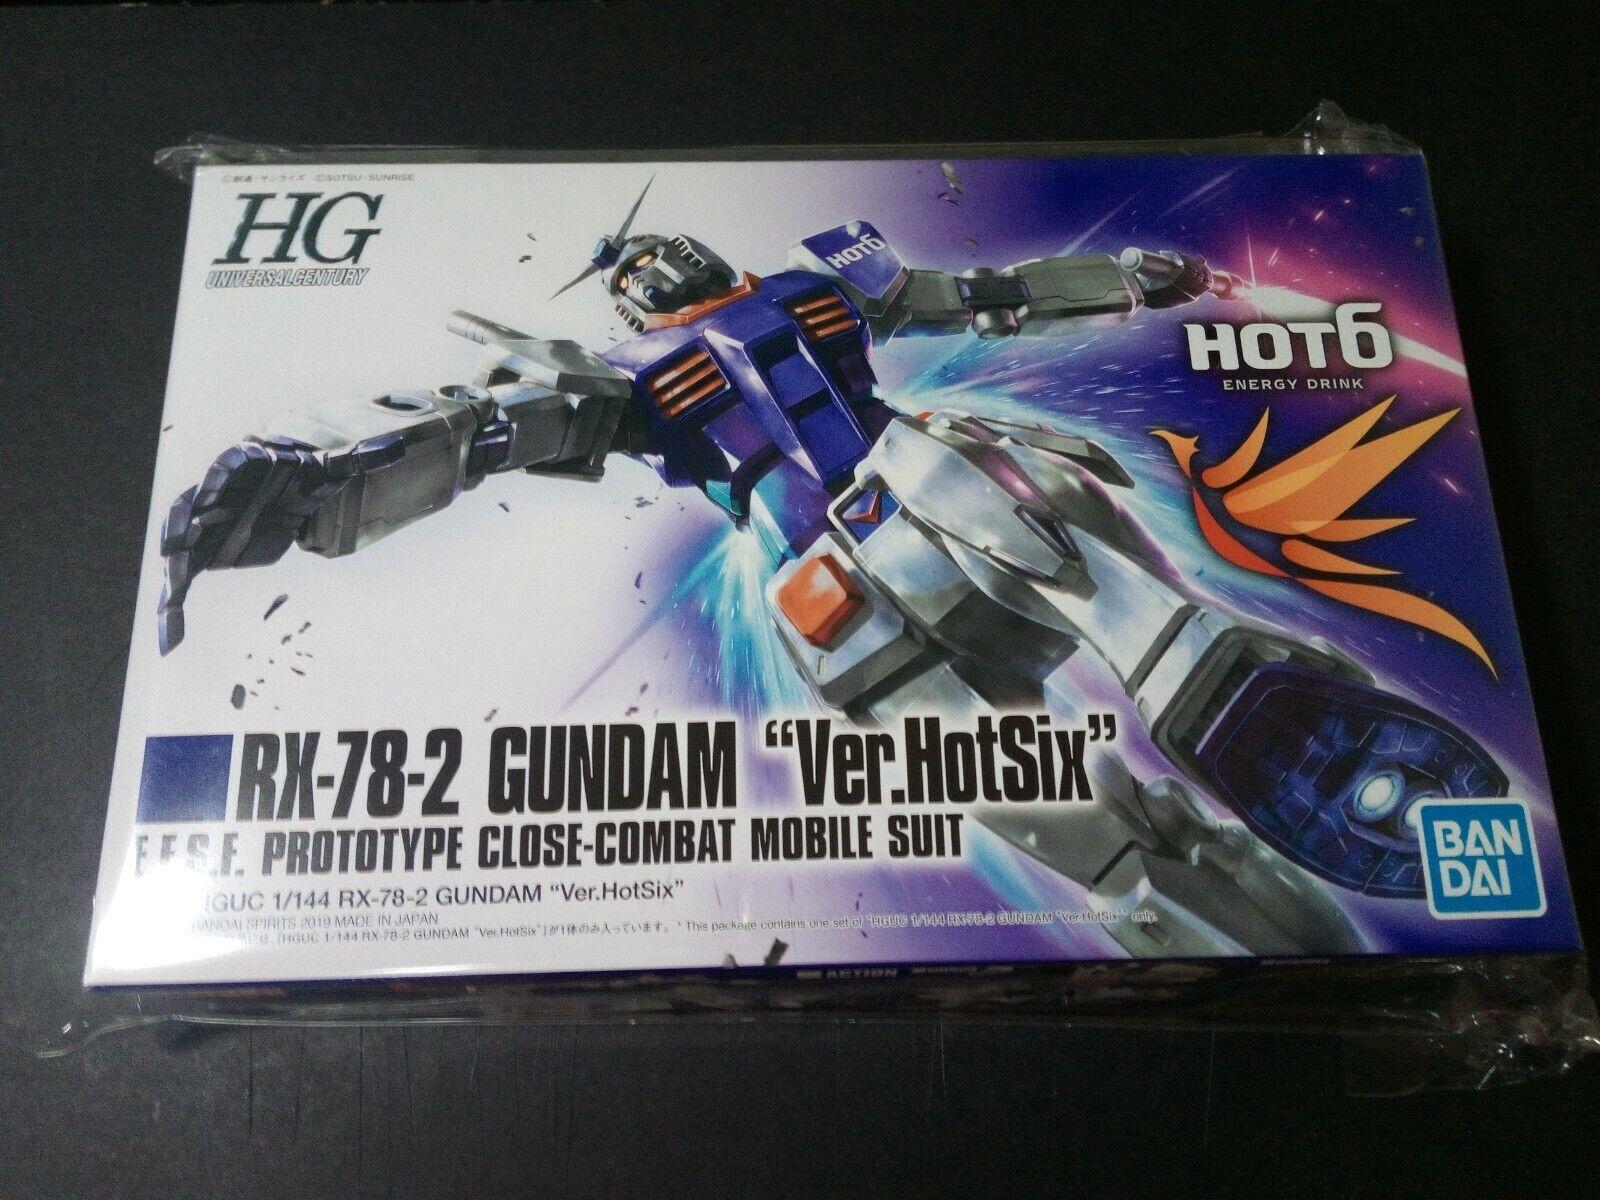 HG RX -78 -2 GUNDAM Ver.varmSix